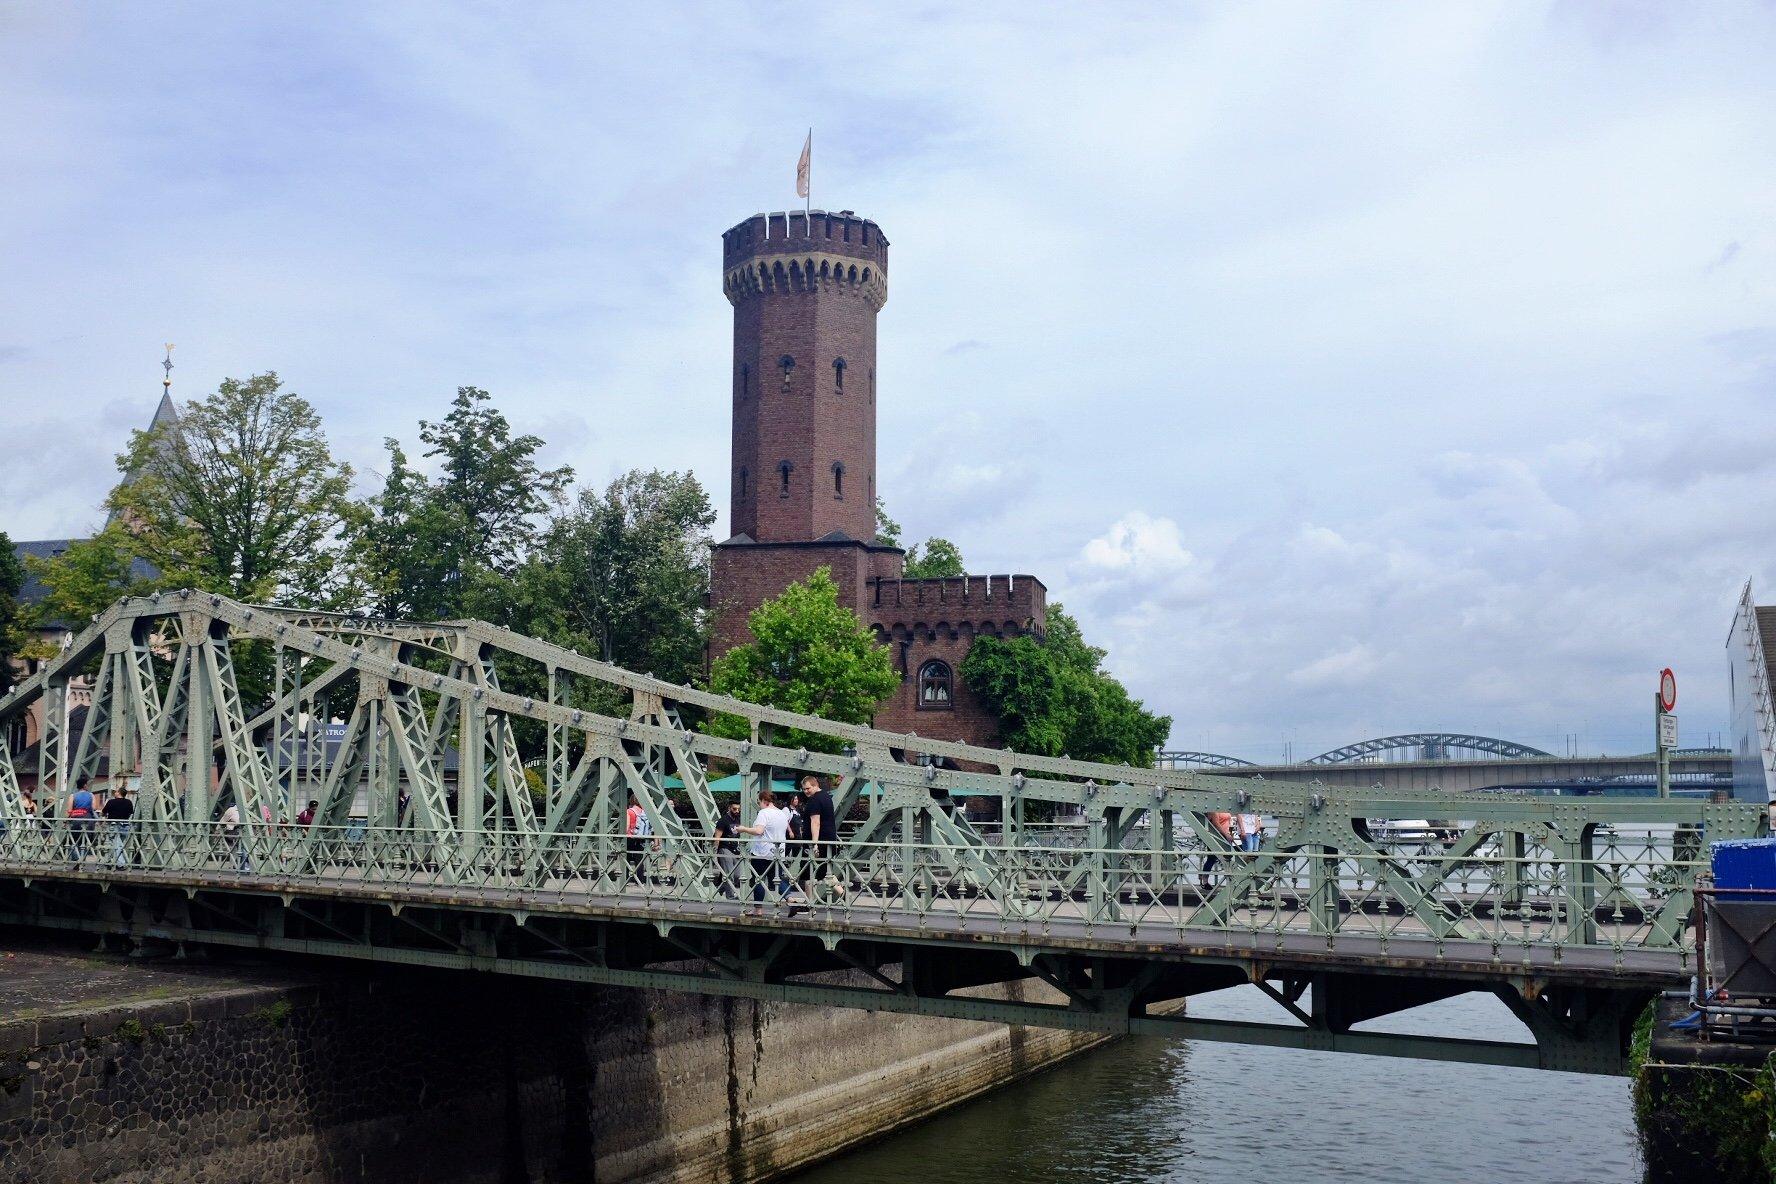 Drehbrücke Malakoffturm Köln Cologne Gallery Trip Gourmets